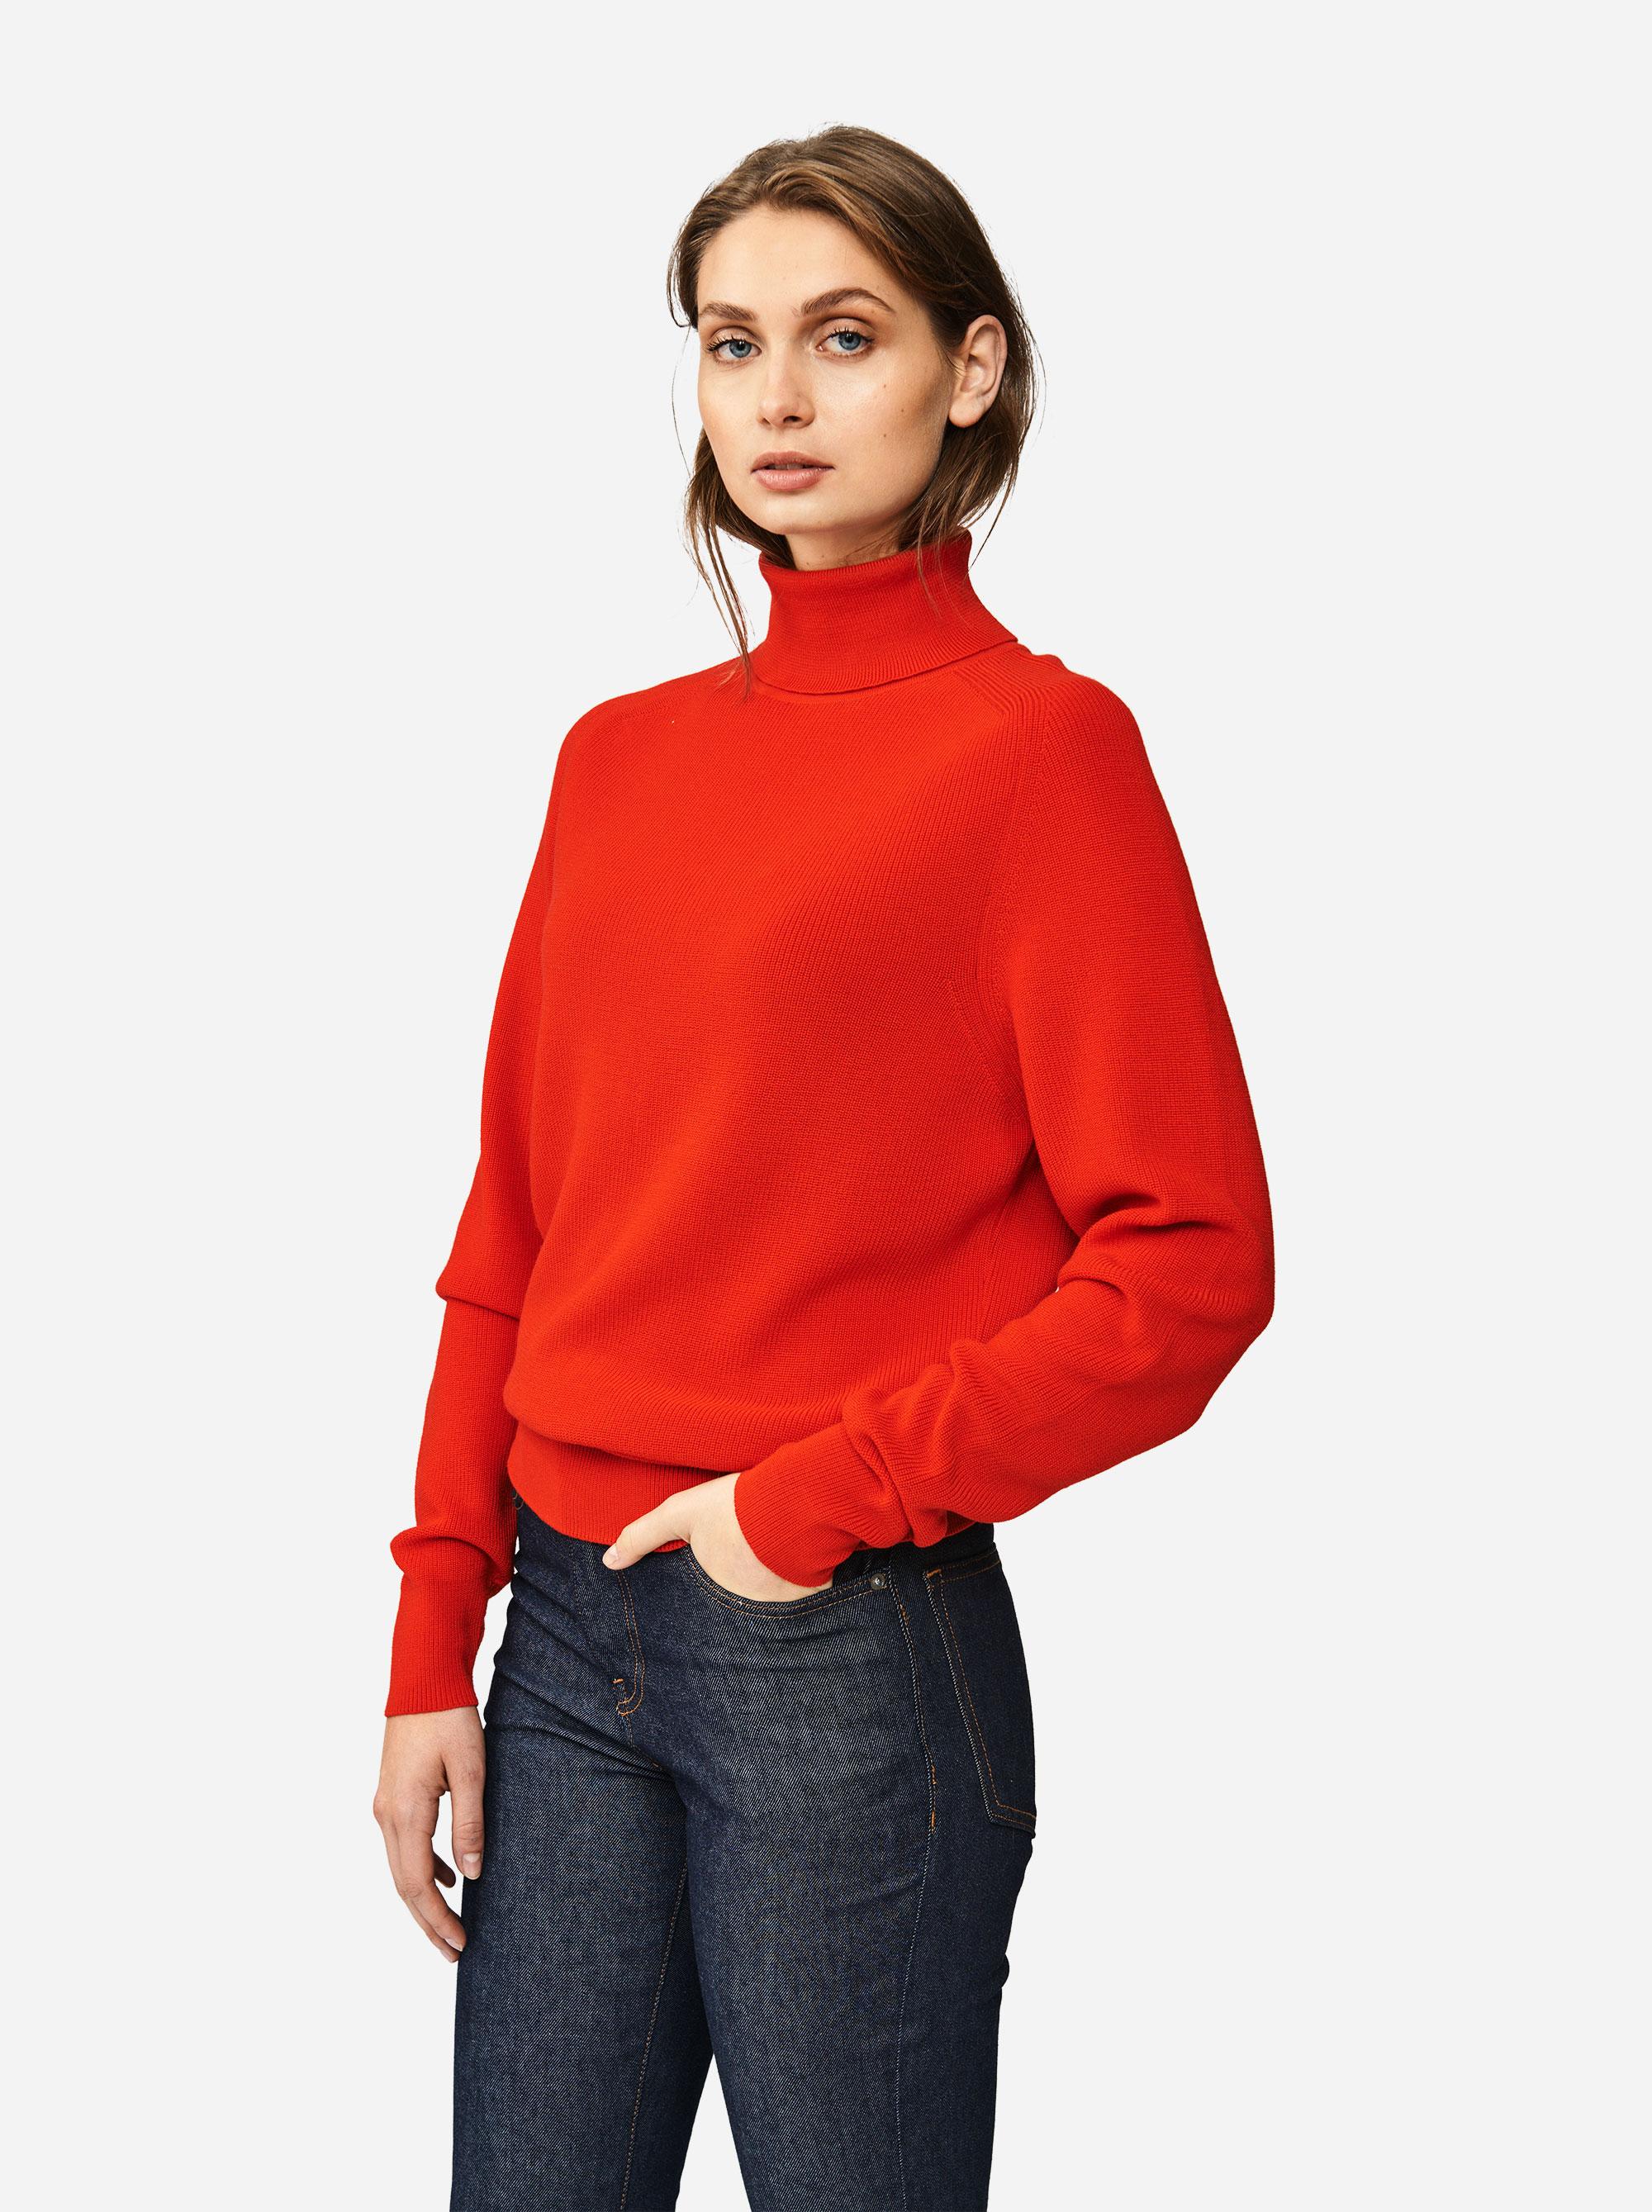 Teym - Turtleneck - The Merino Sweater - Men - Red - 1